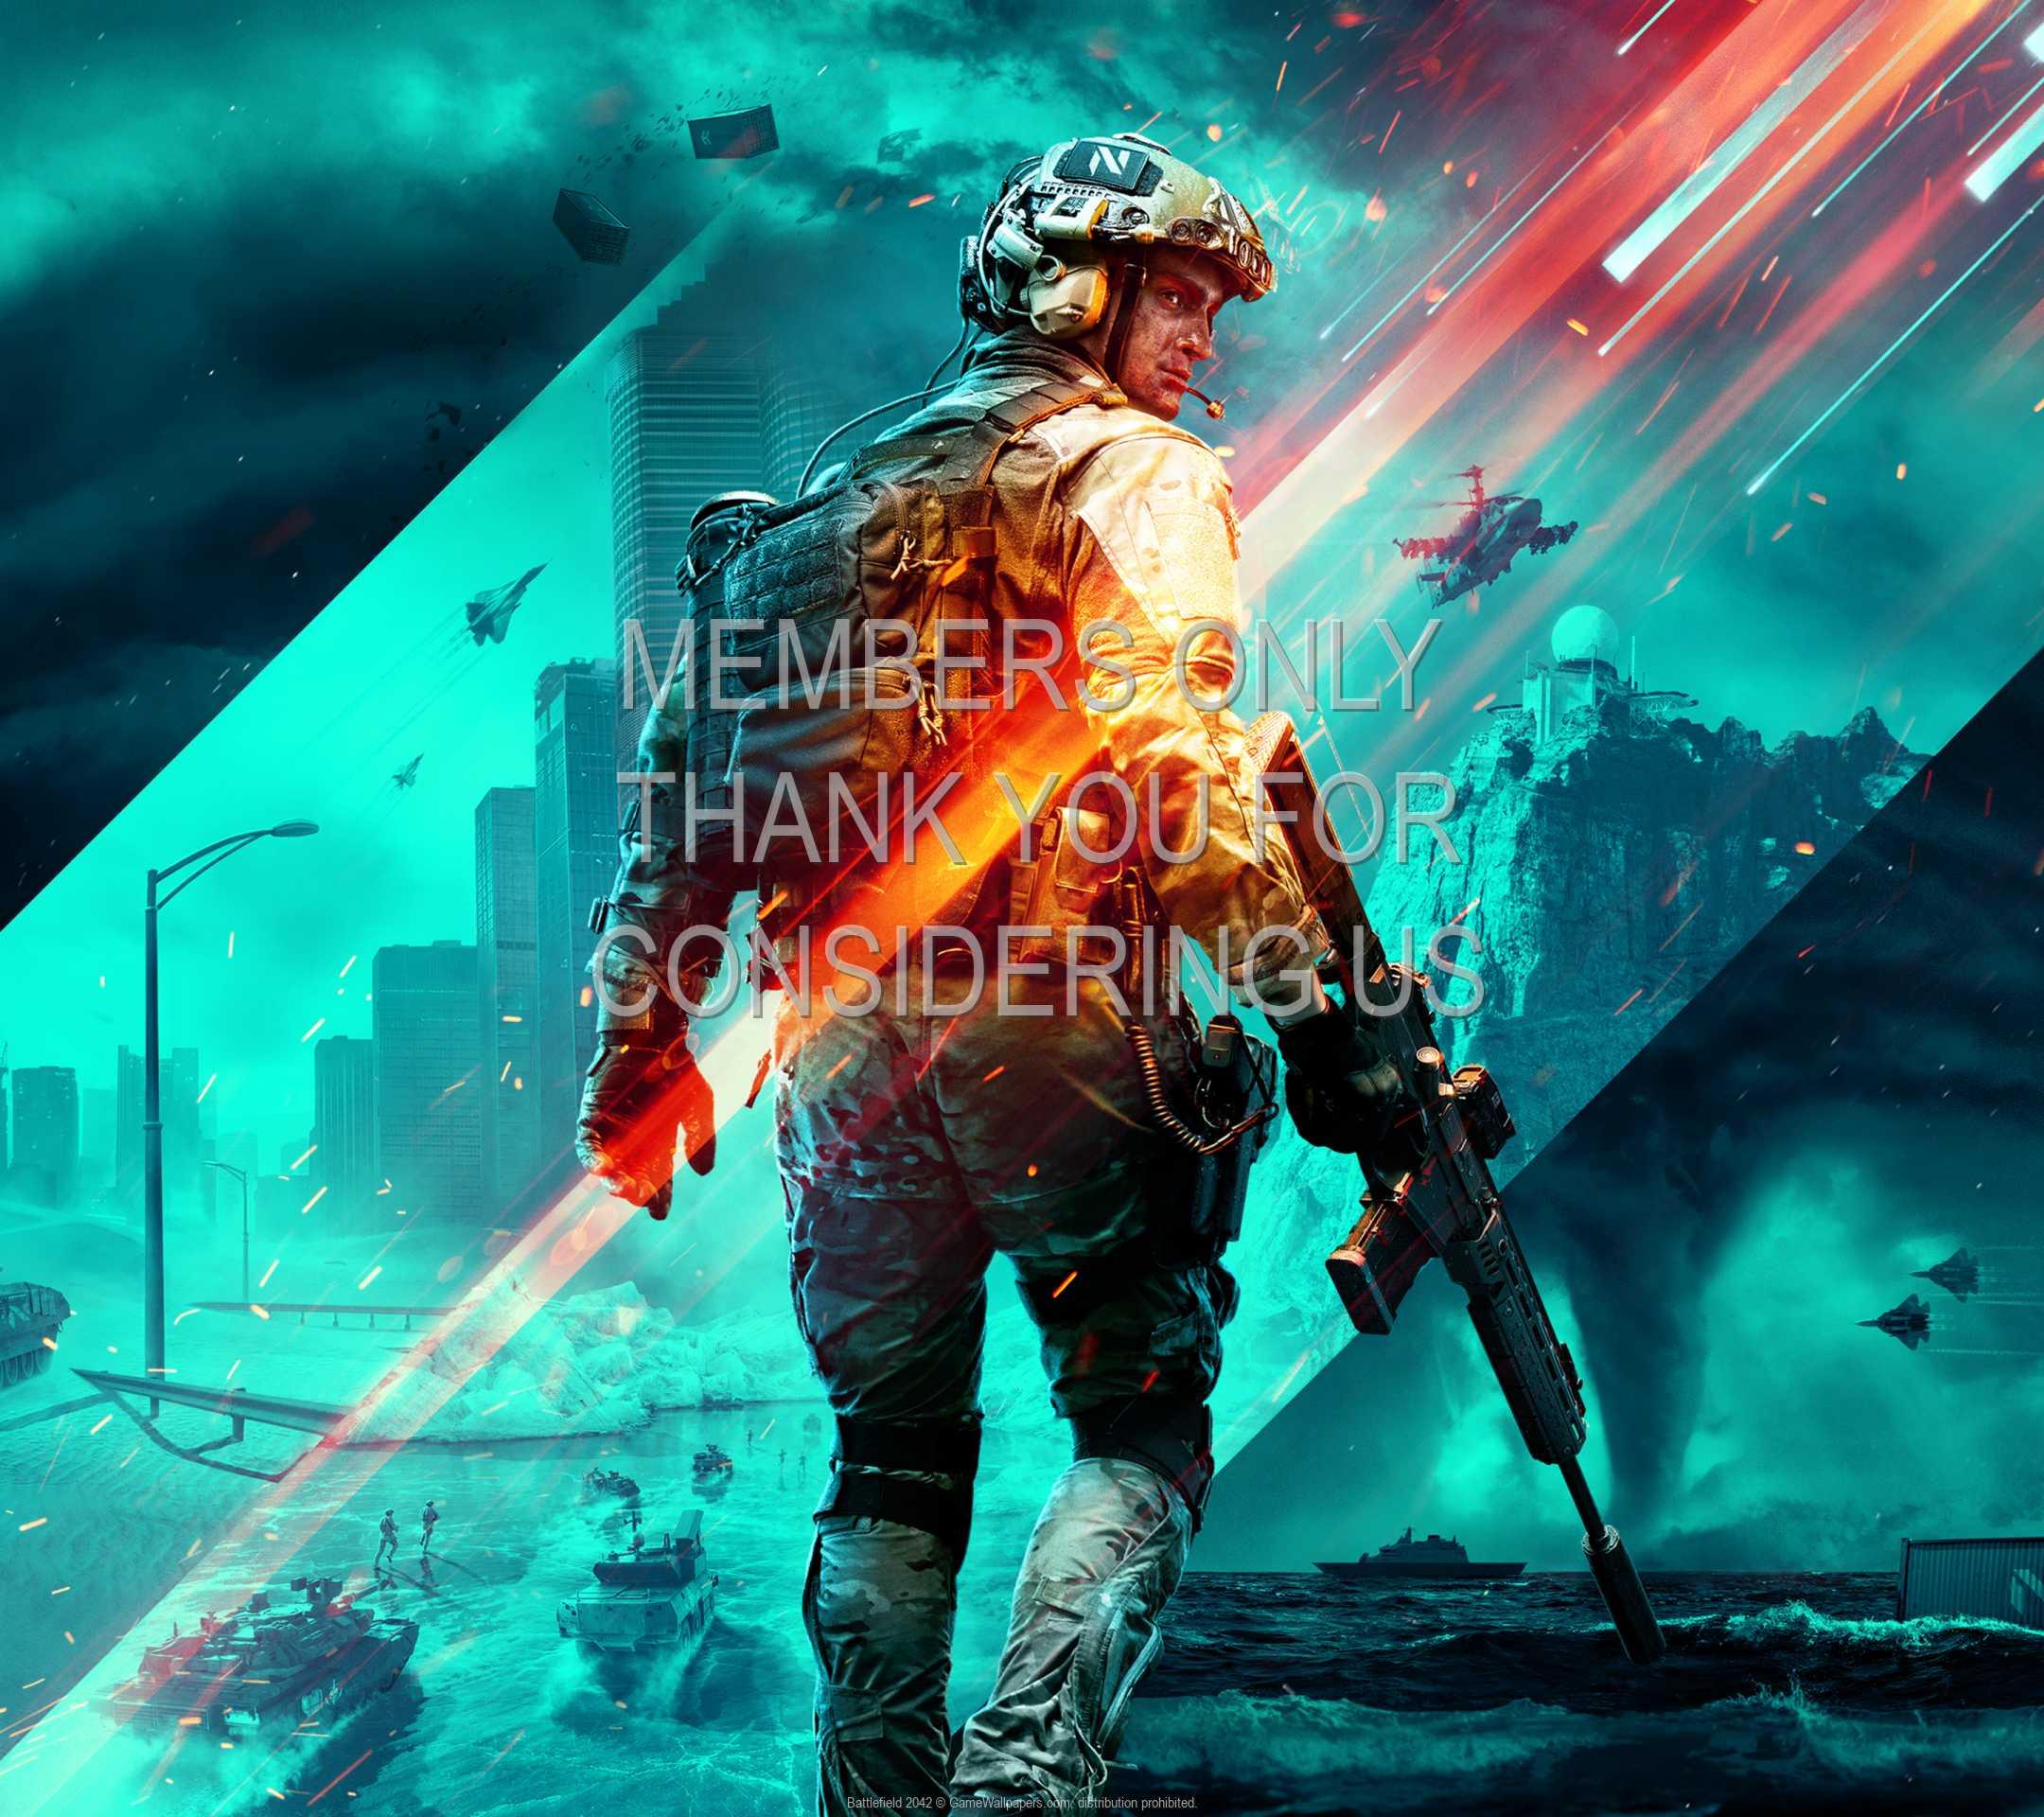 Battlefield 2042 1080p Horizontal Mobile wallpaper or background 02